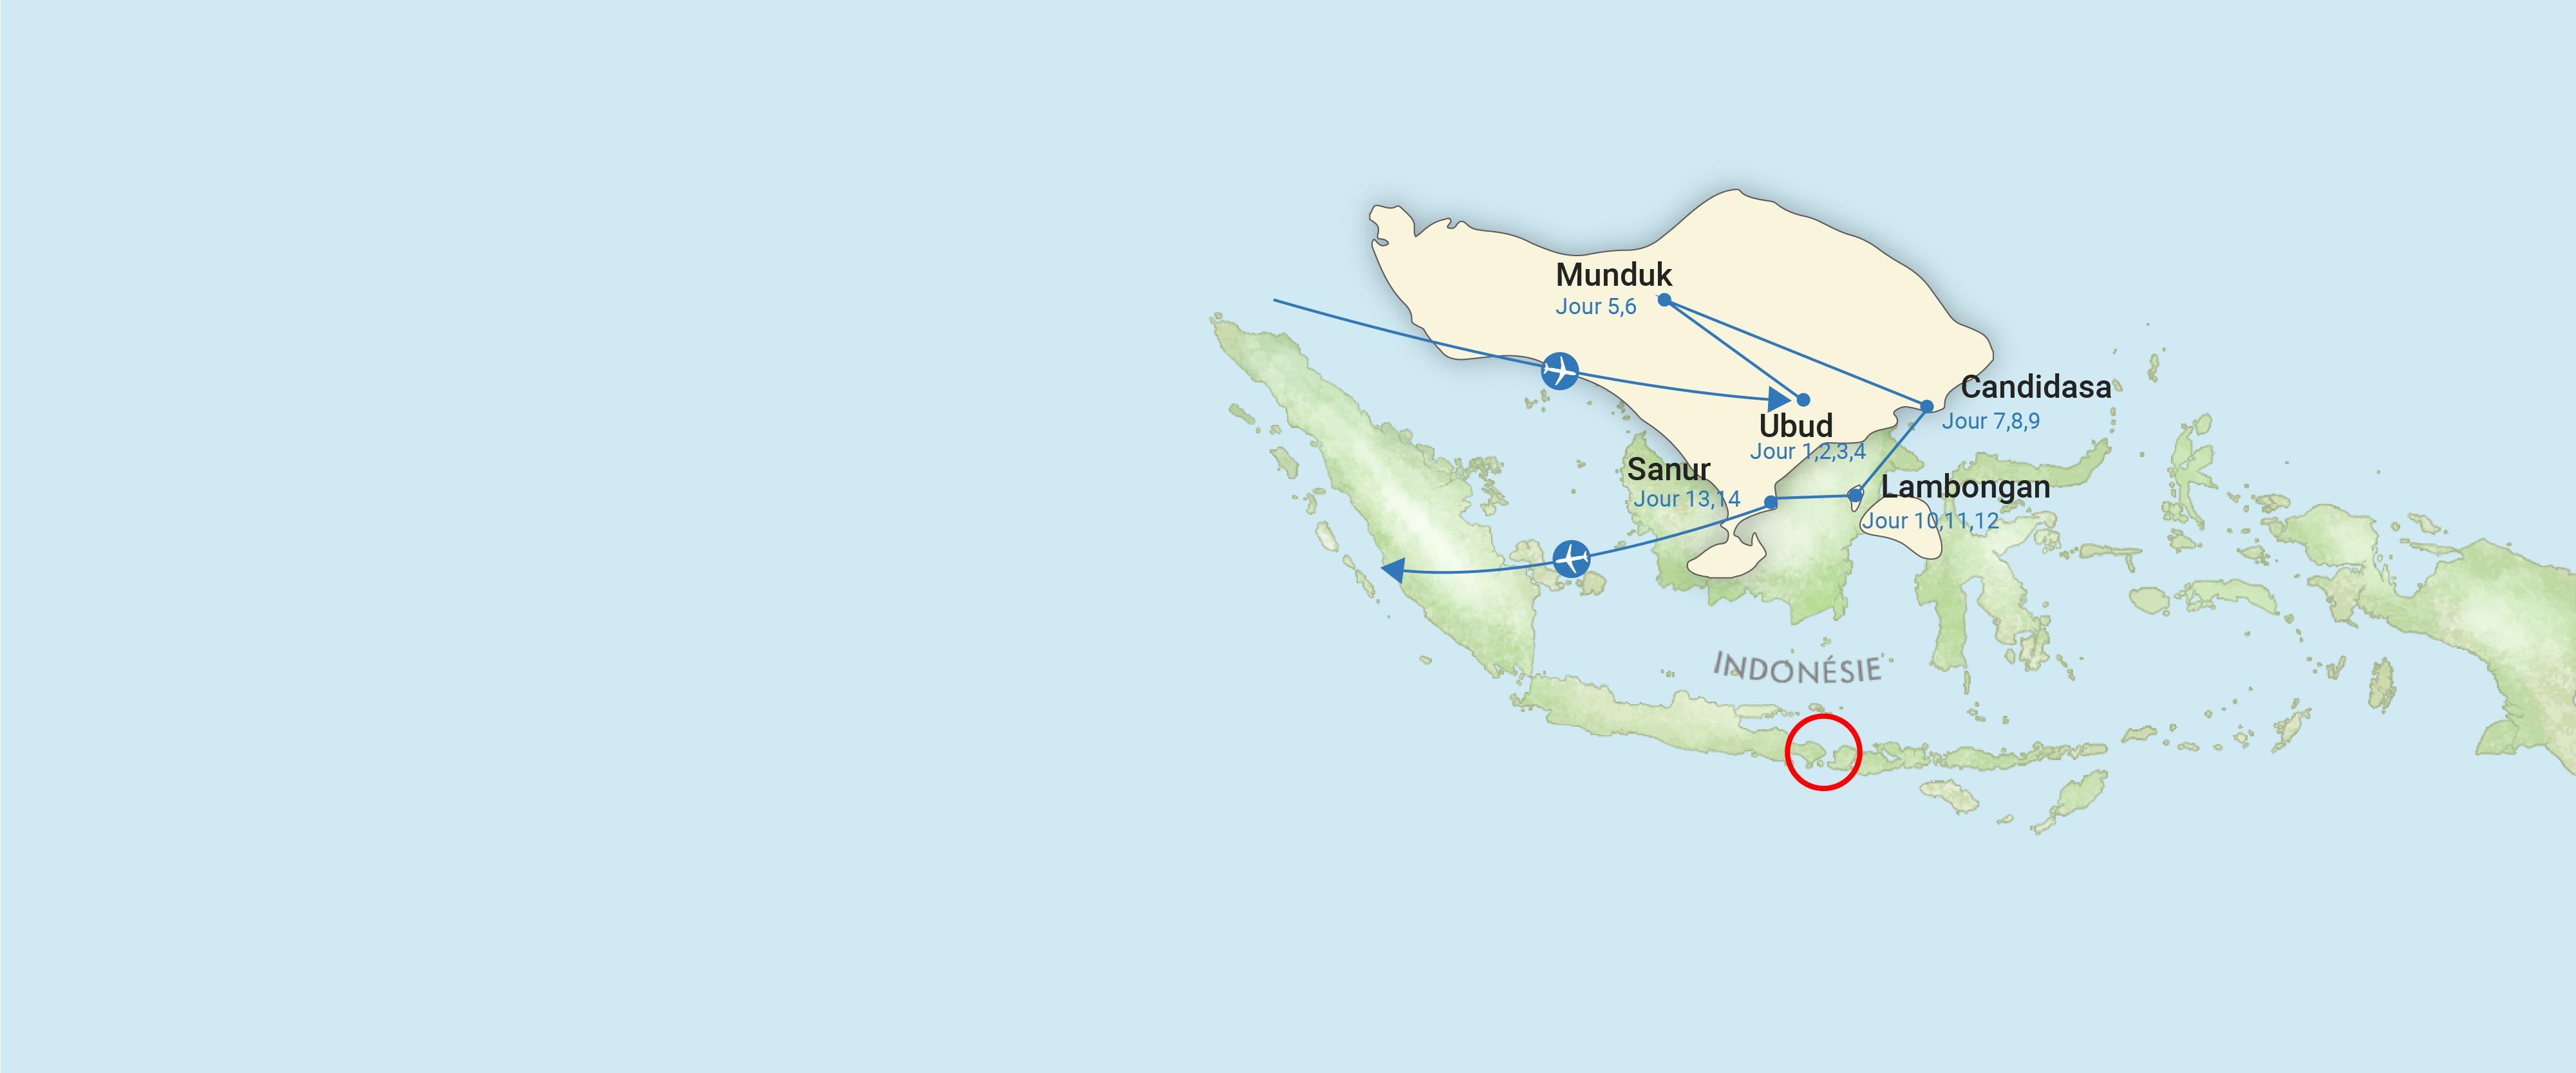 indonesie, carte, voyage, asiatica travel, bali, famille, decouverte